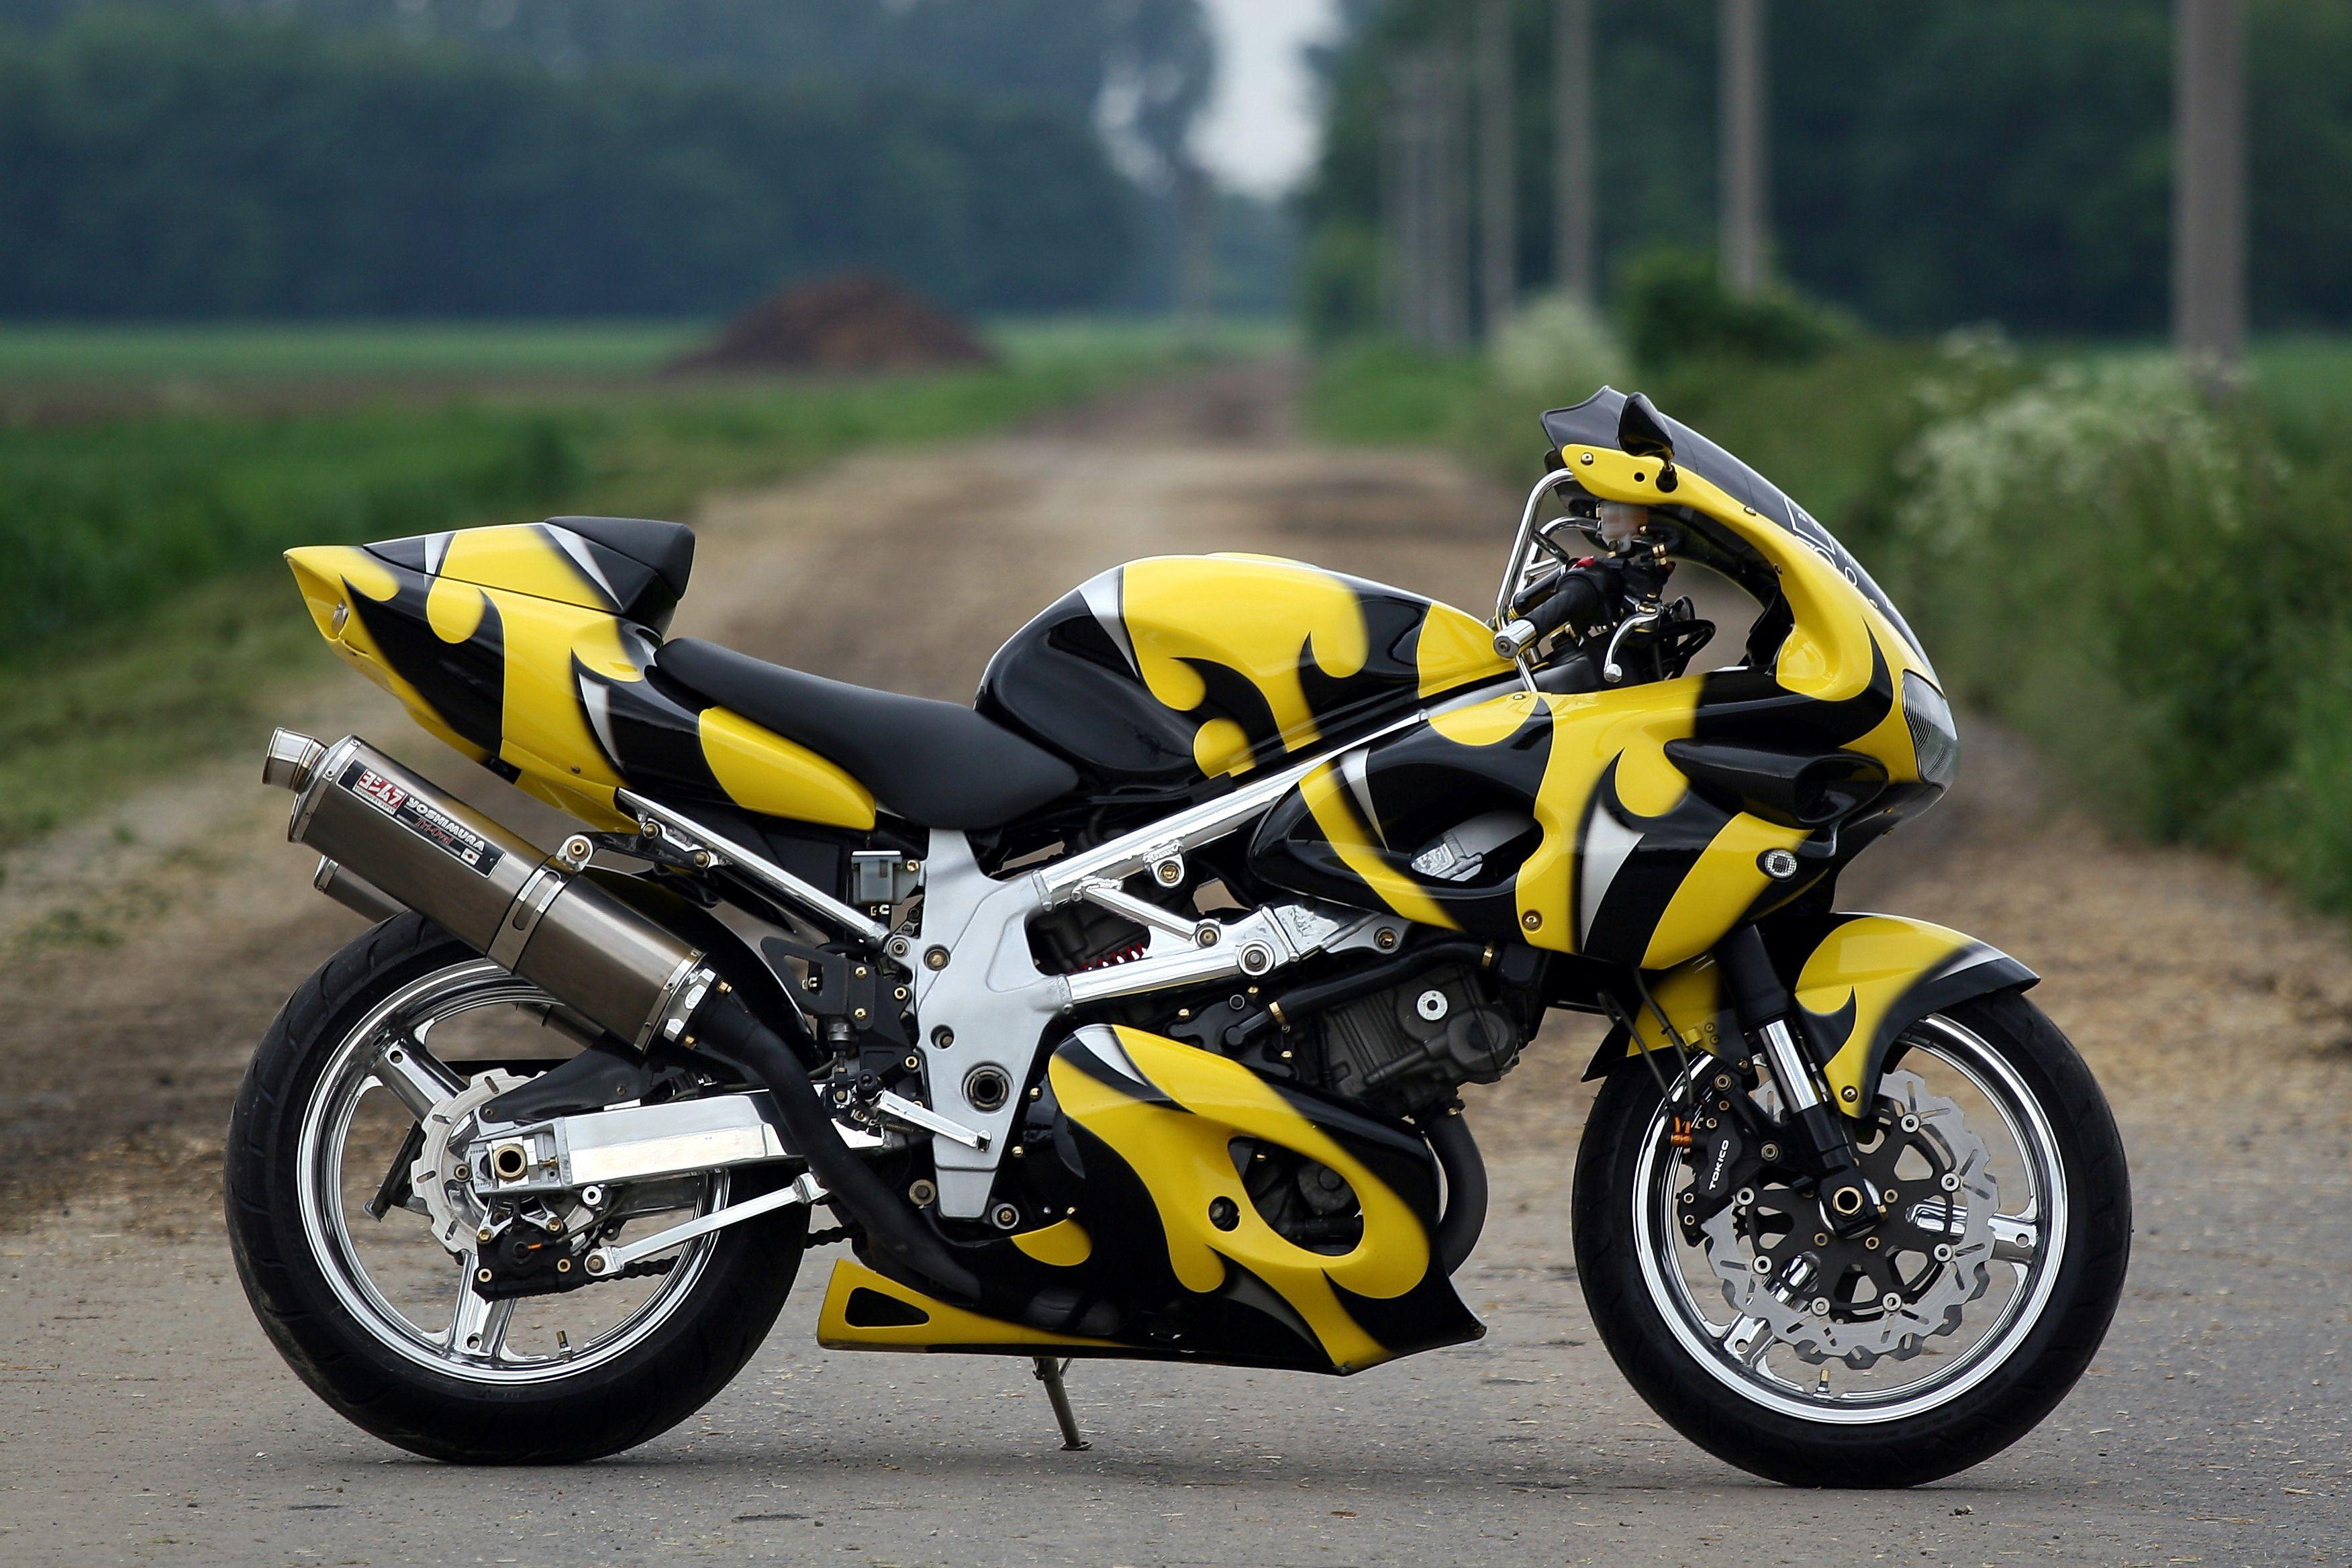 1997 Suzuki Tl1000 Sportbike for sale on 2040-motos